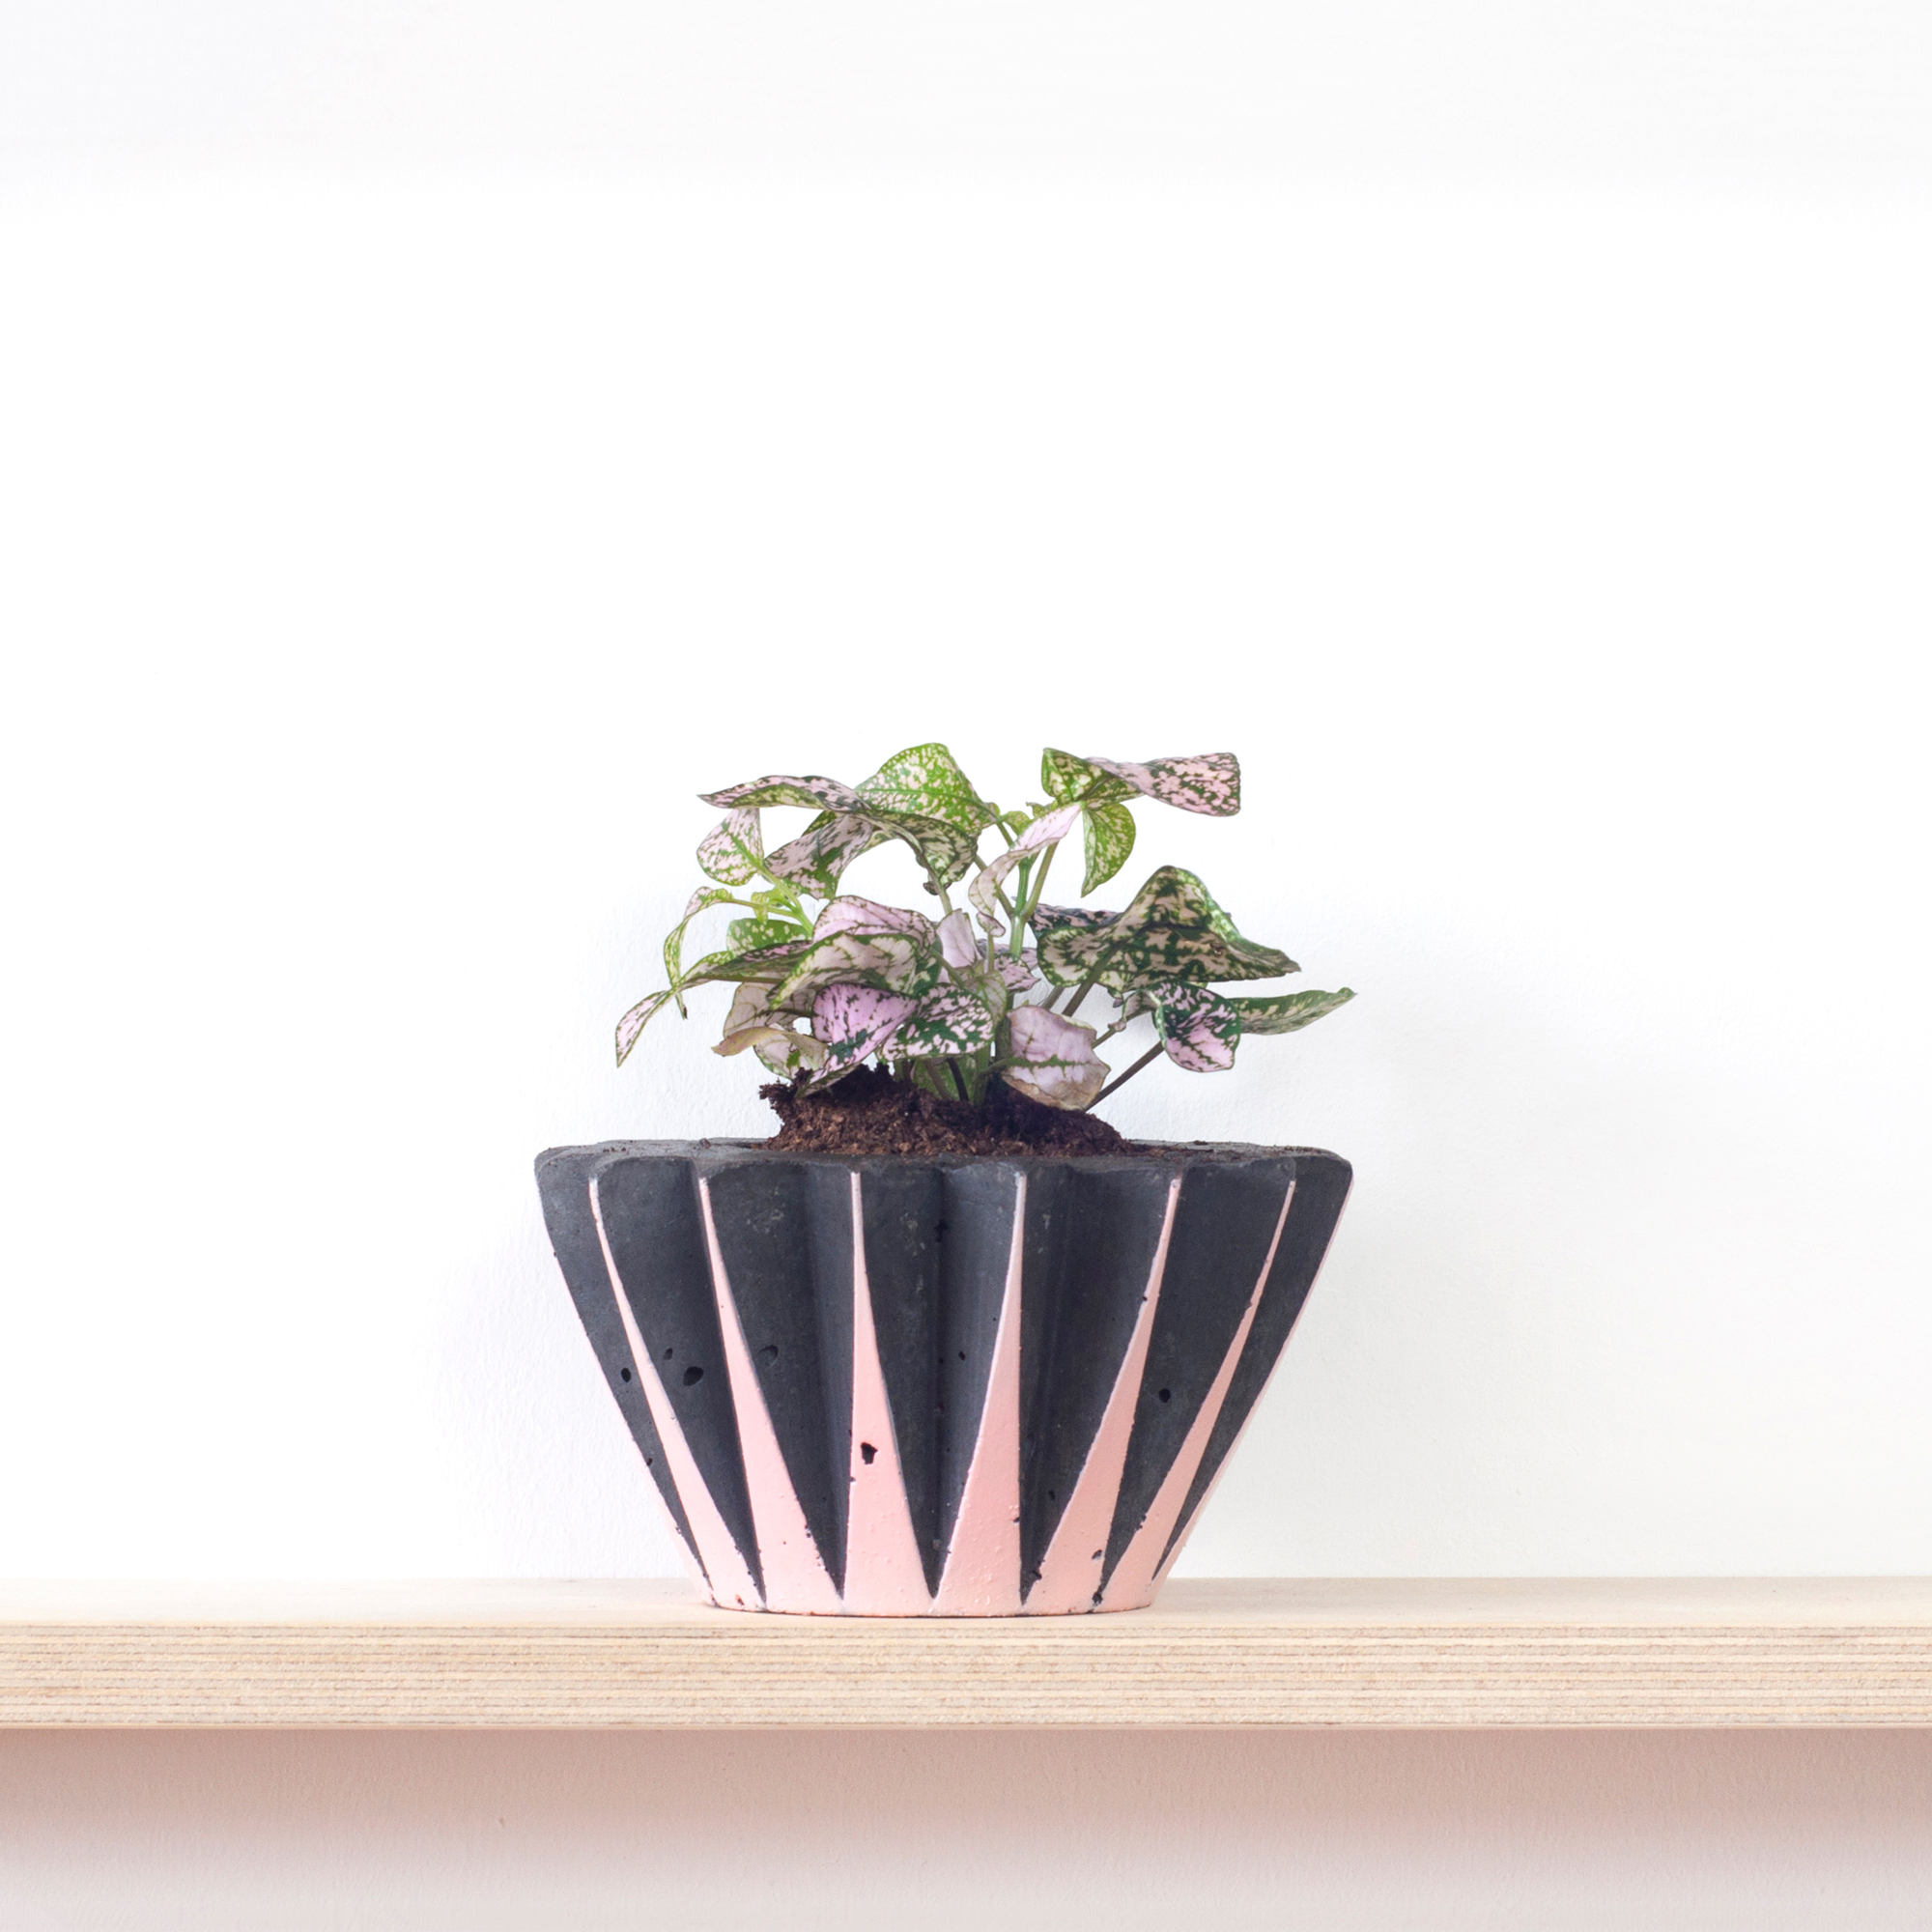 2-plantpot-geofleur-web.jpg